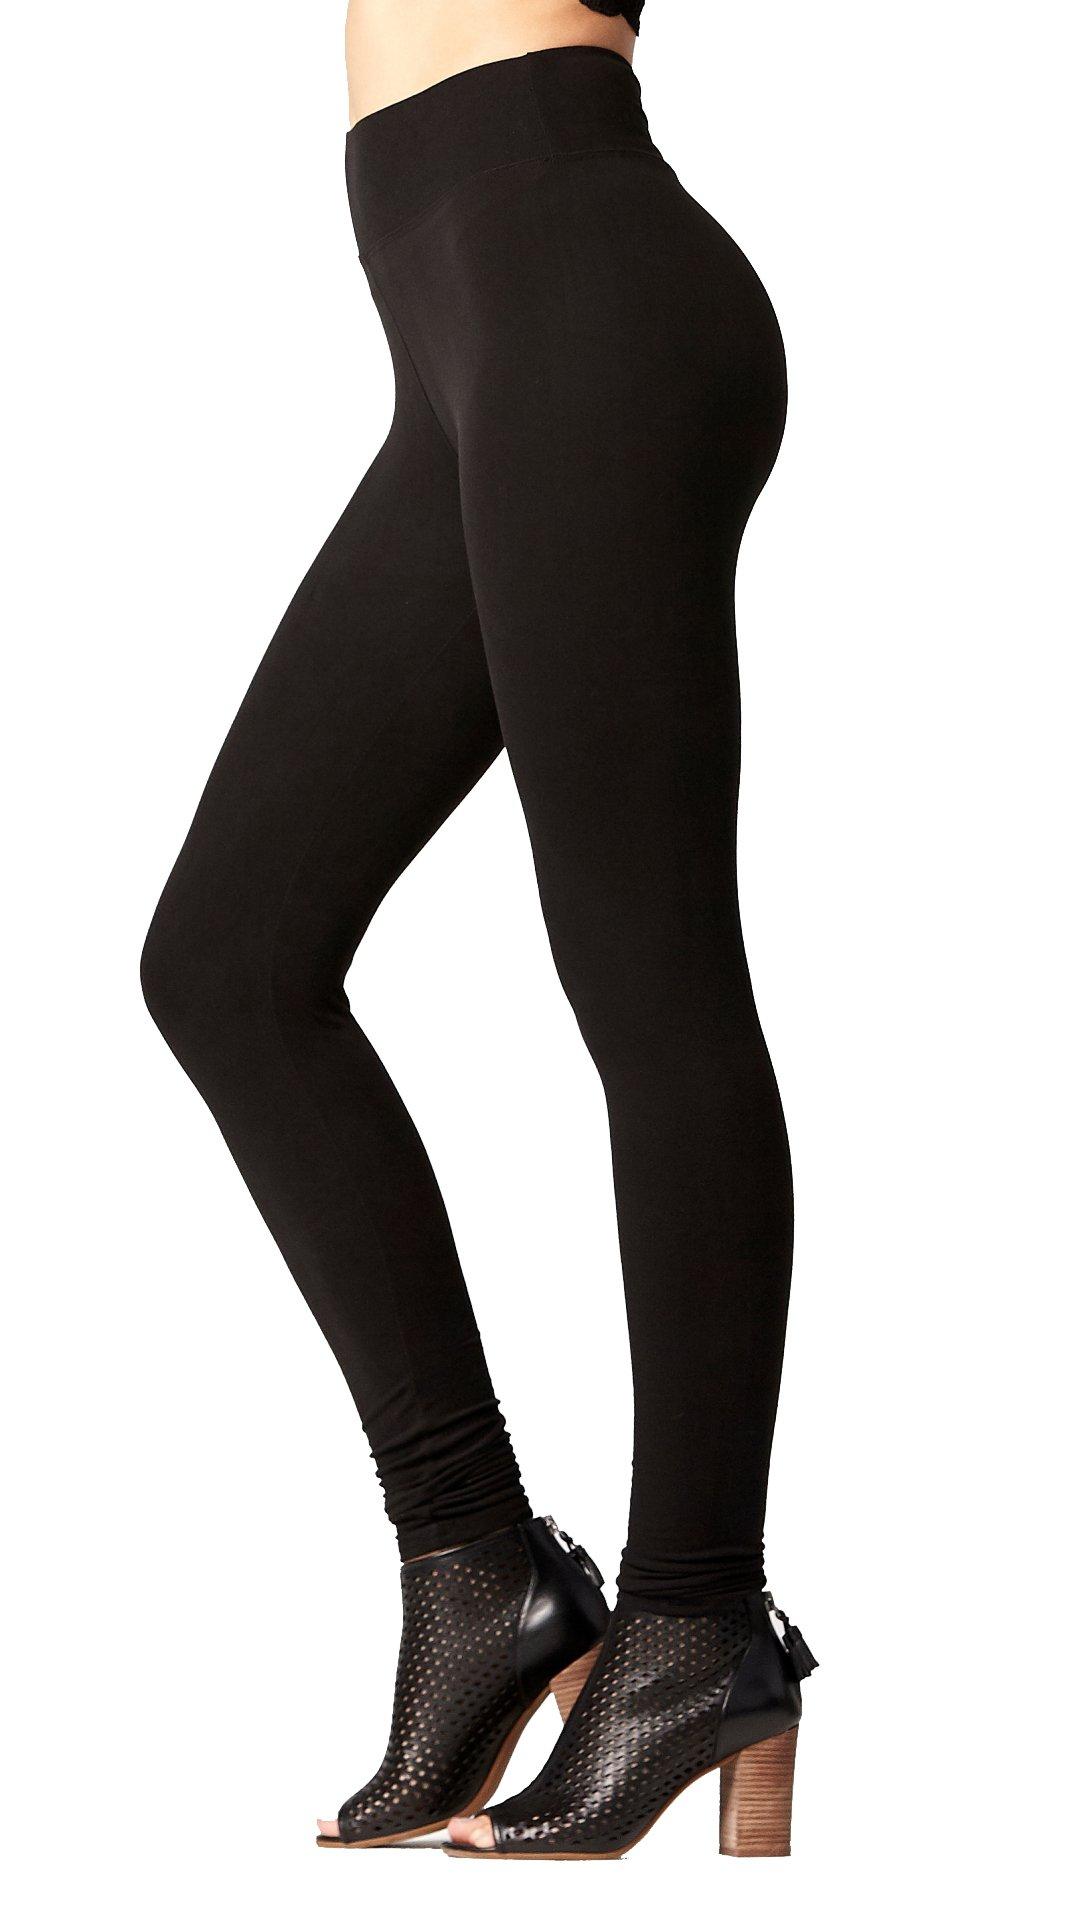 Premium Ultra Soft High Waist Leggings for Women - Full Length Midnight Black - X-Small/Small / Medium